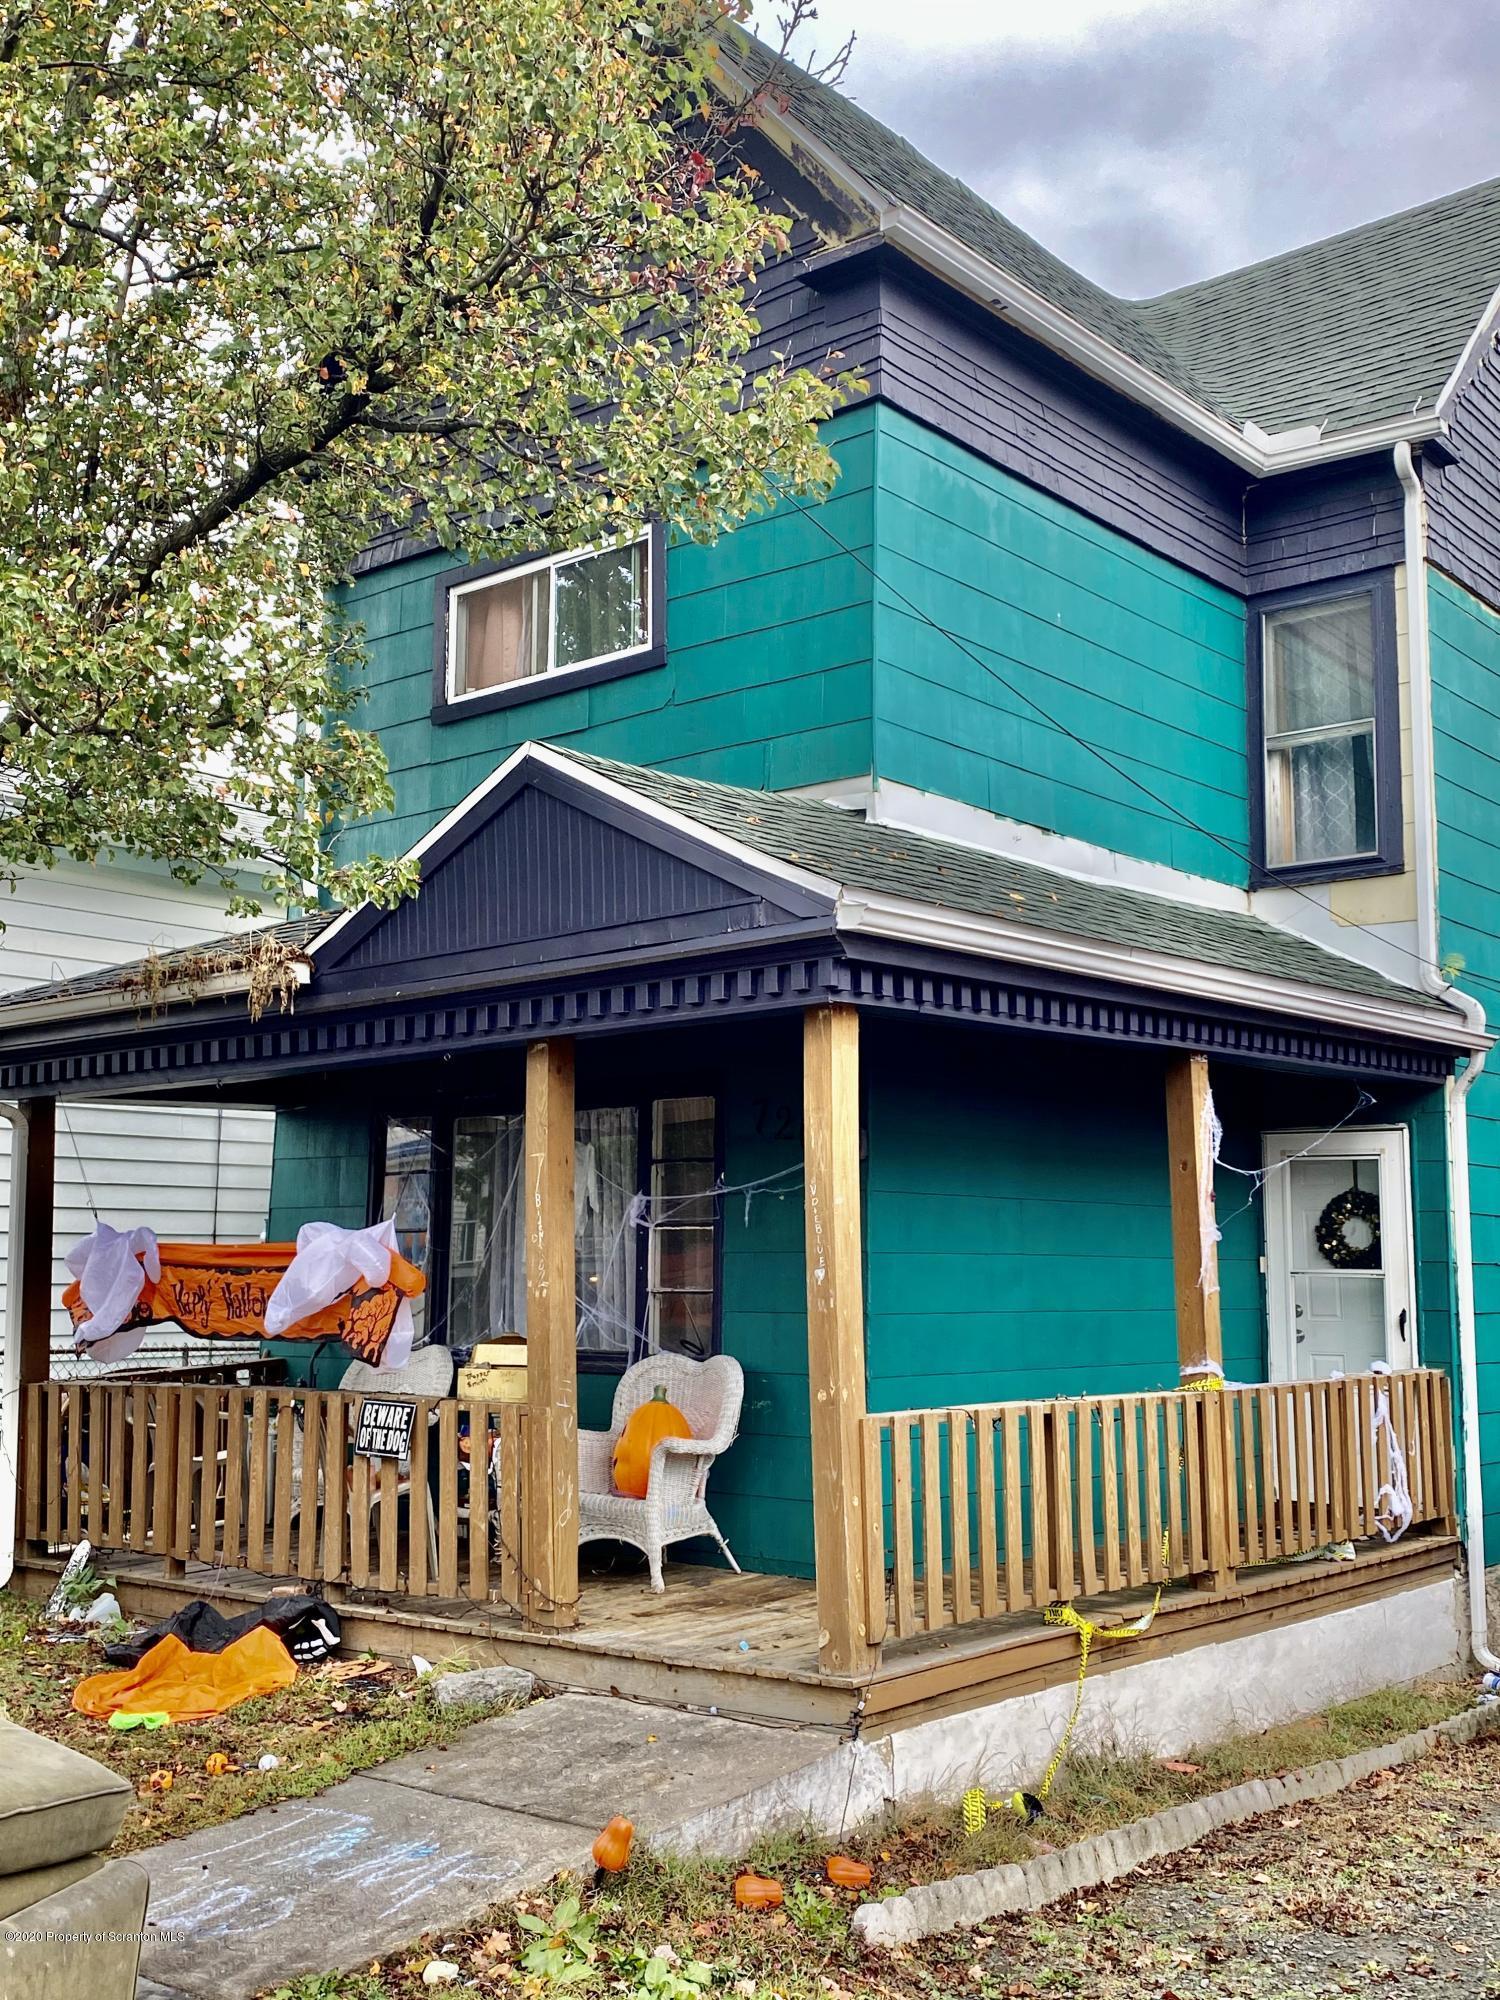 726 Hampton St, Scranton, Pennsylvania 18504, 3 Bedrooms Bedrooms, 6 Rooms Rooms,2 BathroomsBathrooms,Single Family,For Sale,Hampton,20-4670